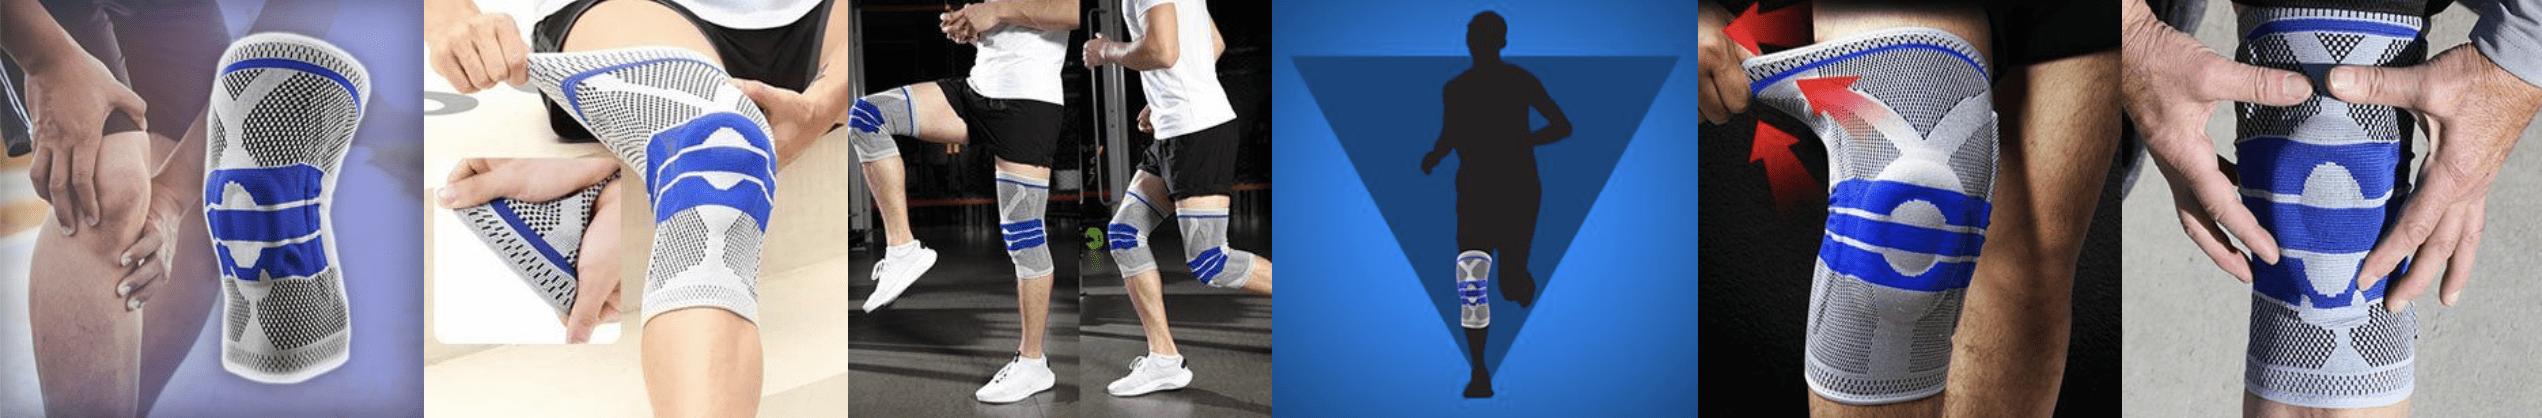 all activity knee brace banner